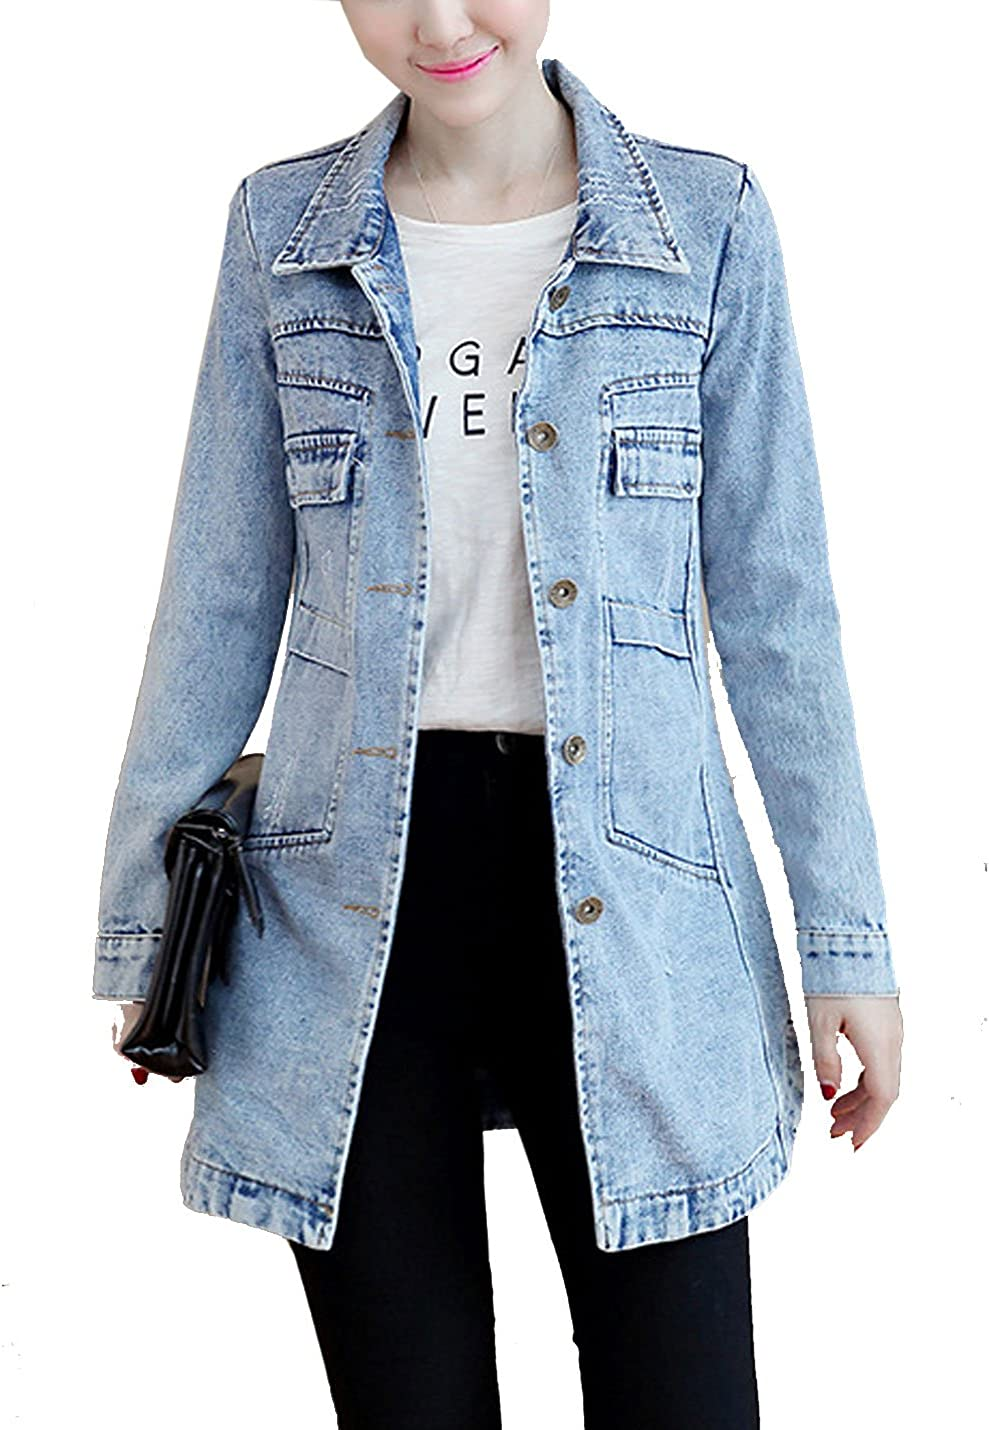 Yeokou Women's Casual Slim Fit Mid Button shop Jean Arlington Mall Down J Long Denim